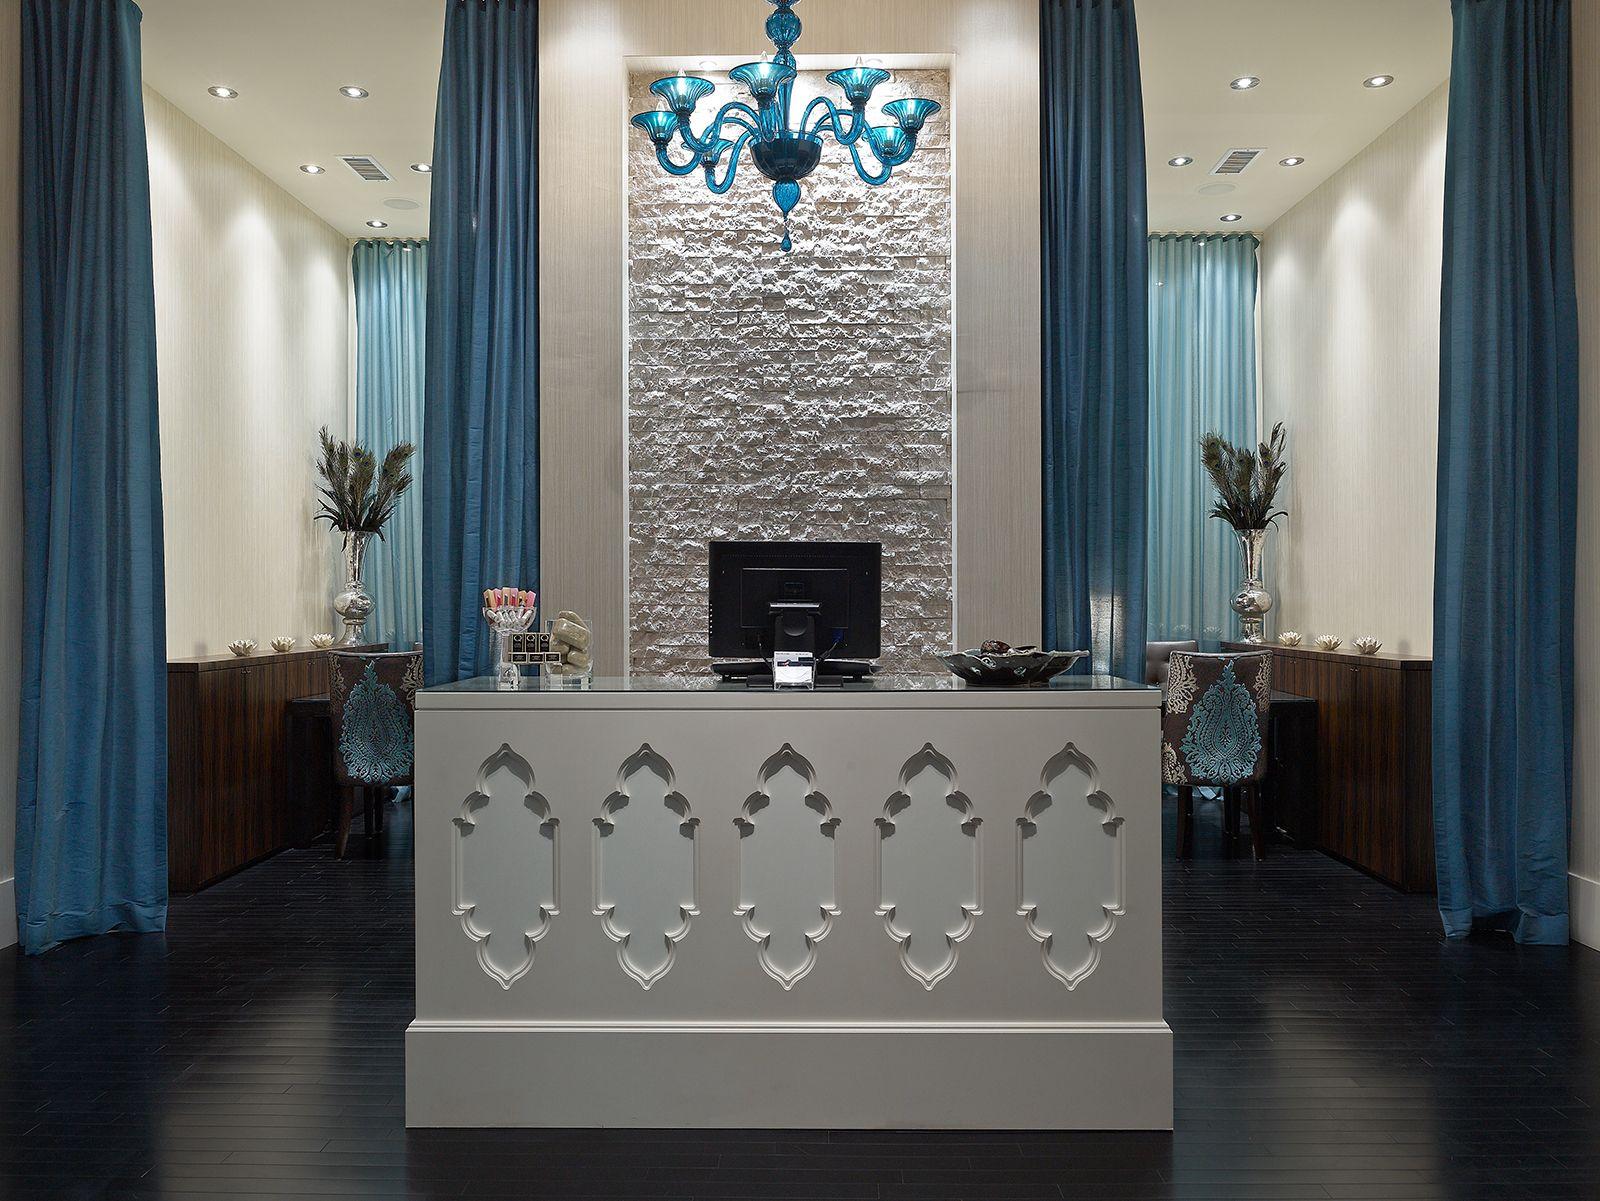 Habachy Designs | Commercial Portfolio | Nail salon interior